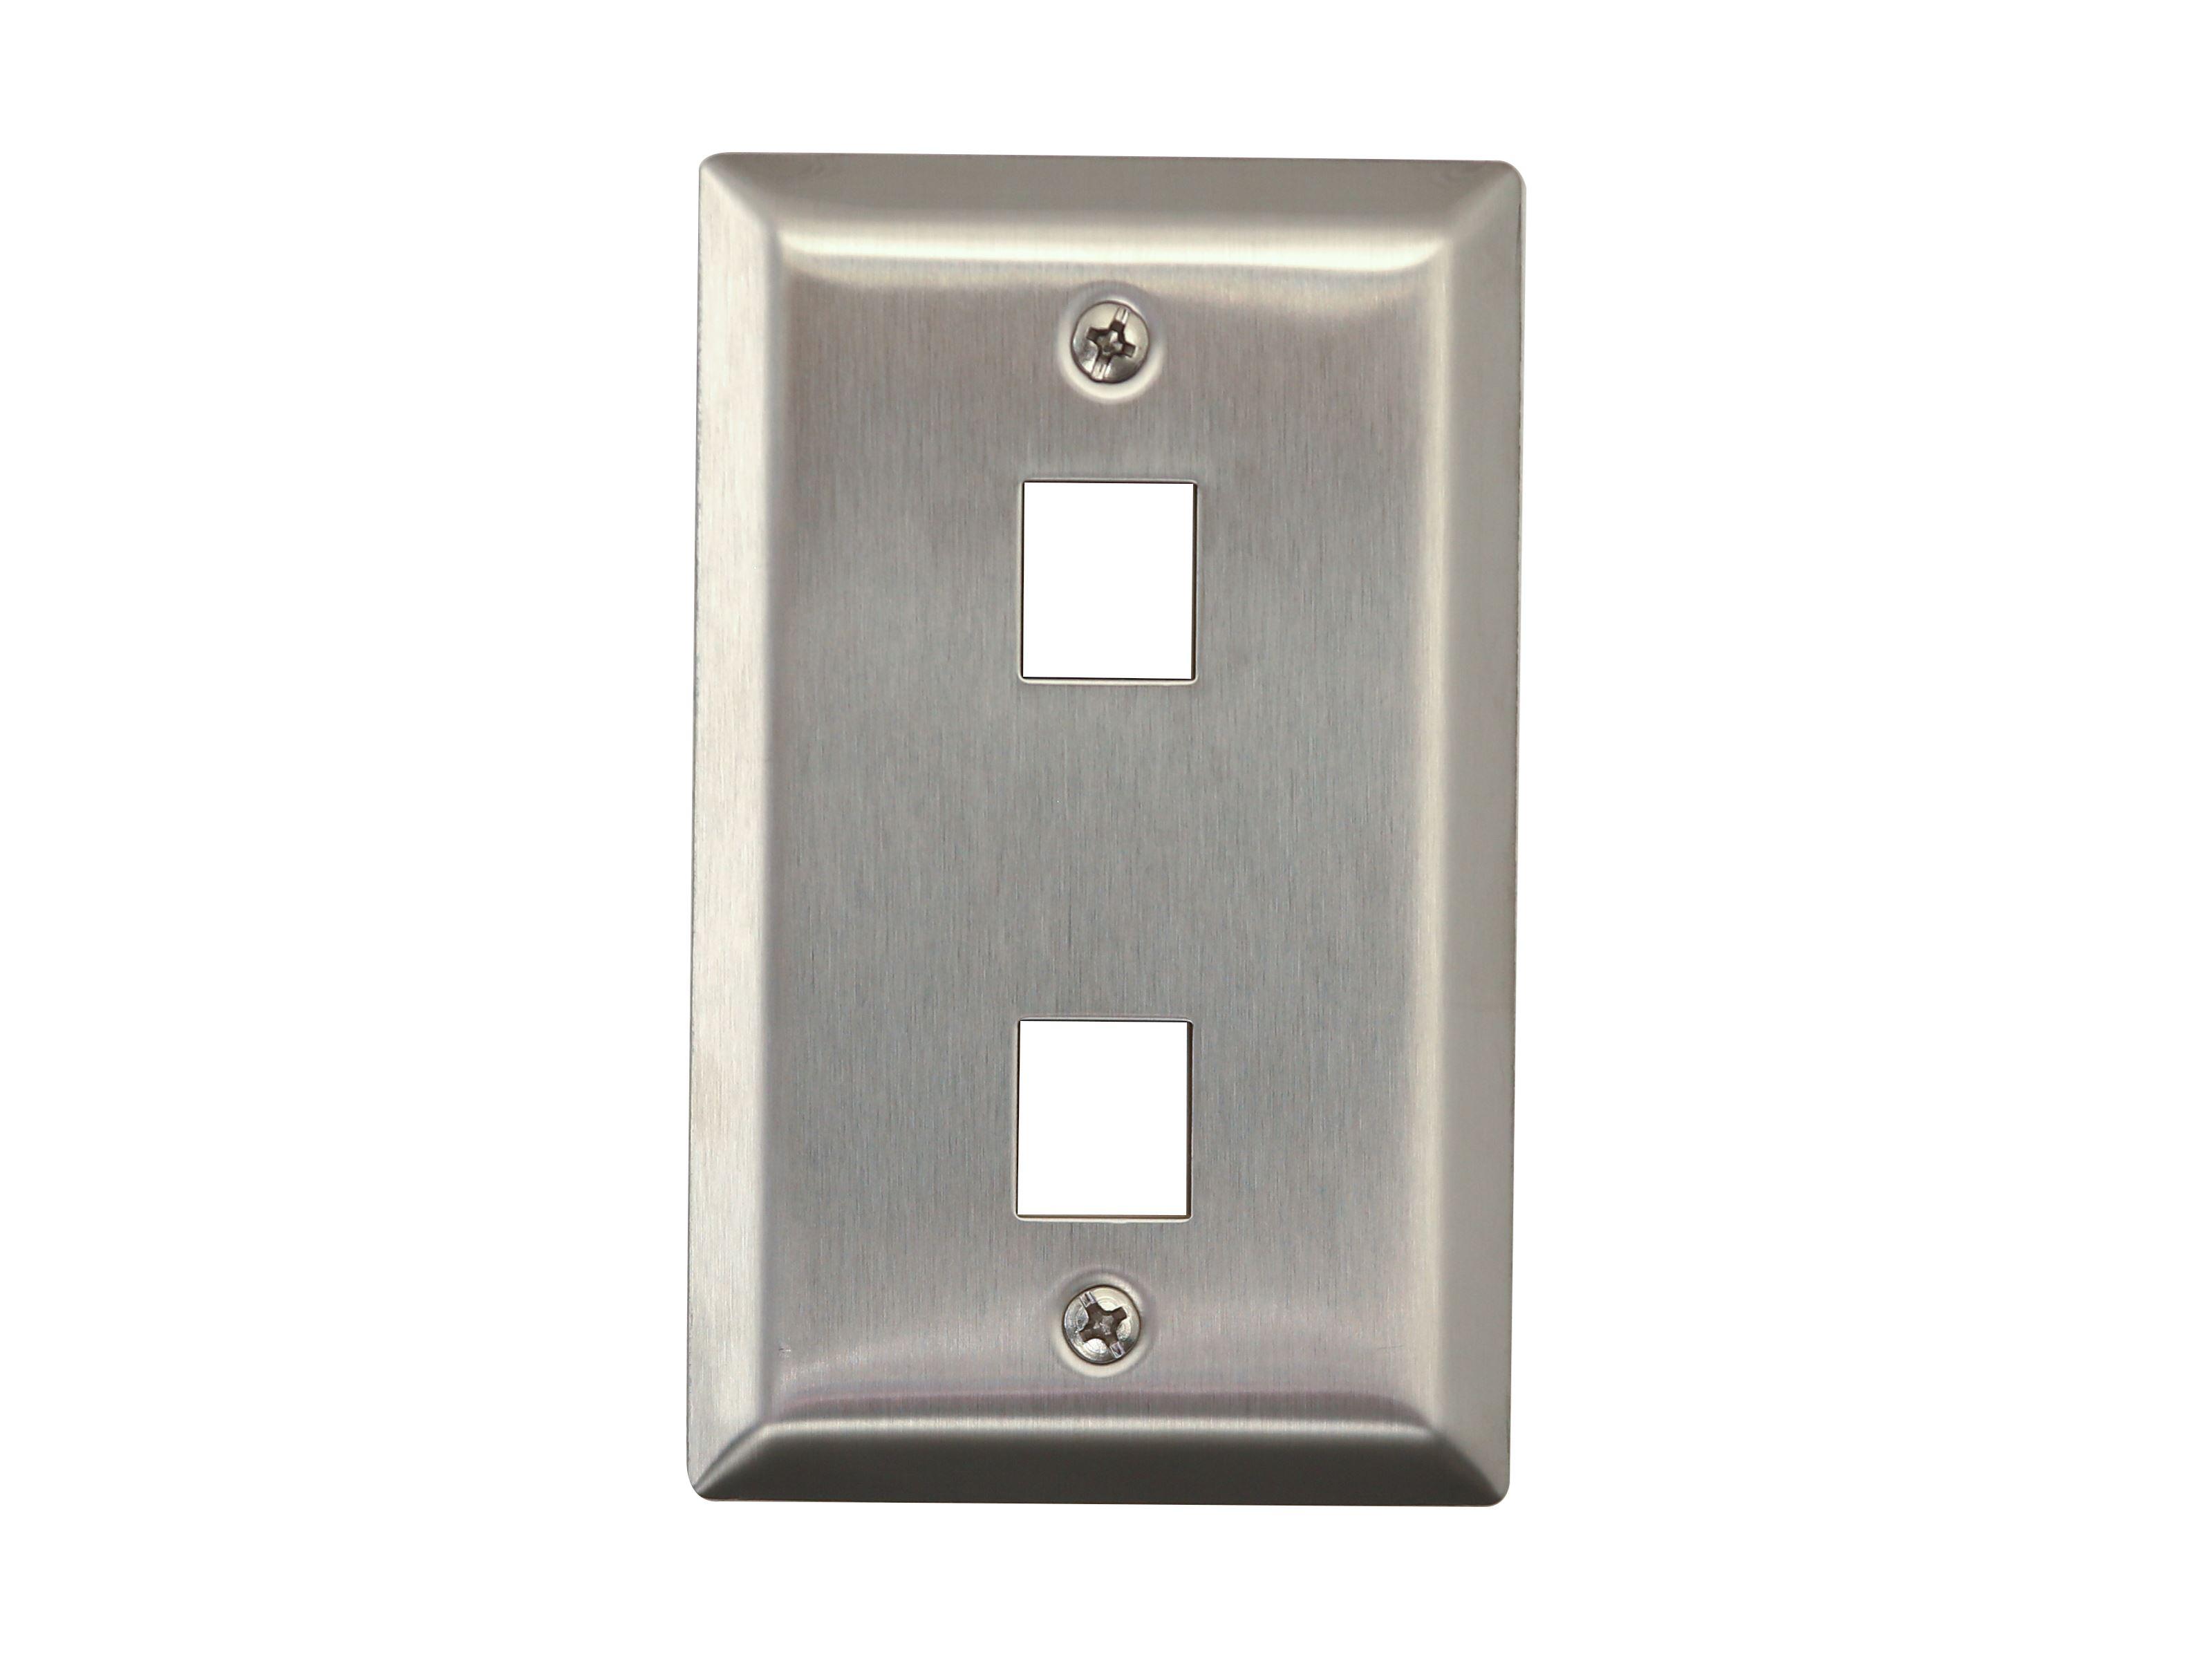 3 Pack White 4 Port//Hole Keystone Jack Modular Wall Plate Faceplate 2-Gang